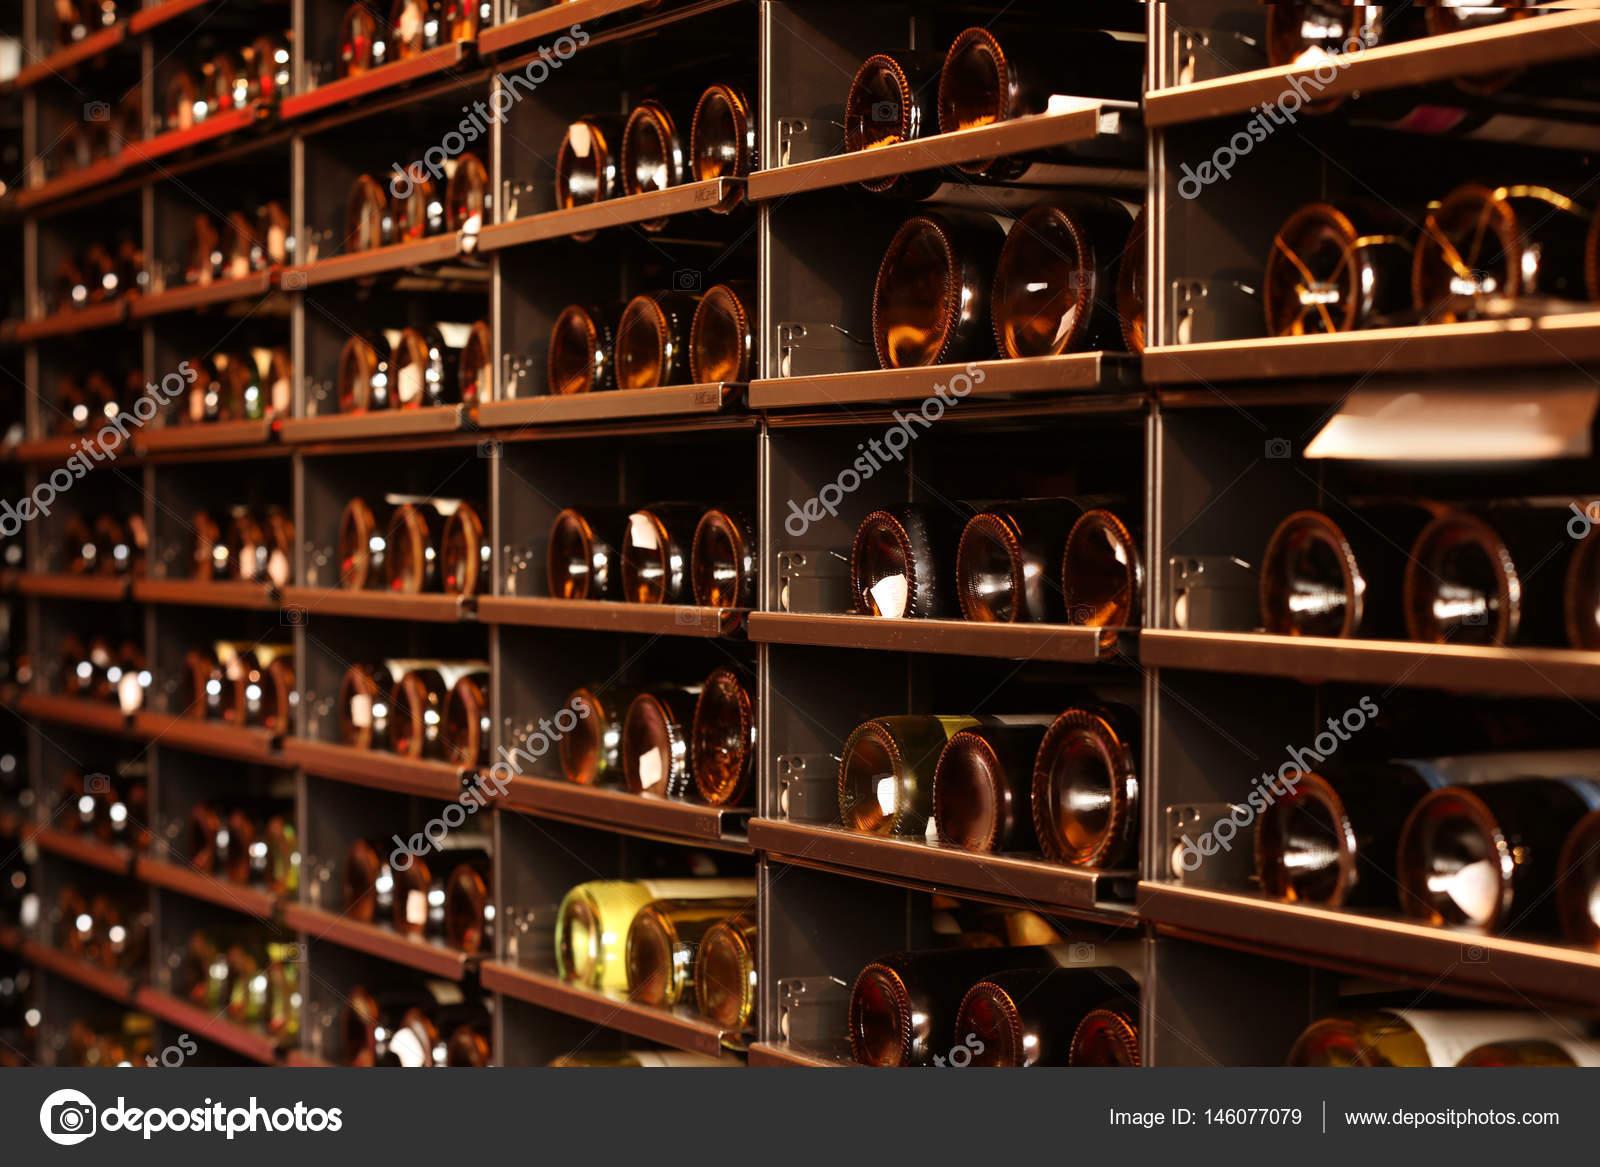 Estanterías con botellas de vino — Foto de stock © belchonock #146077079